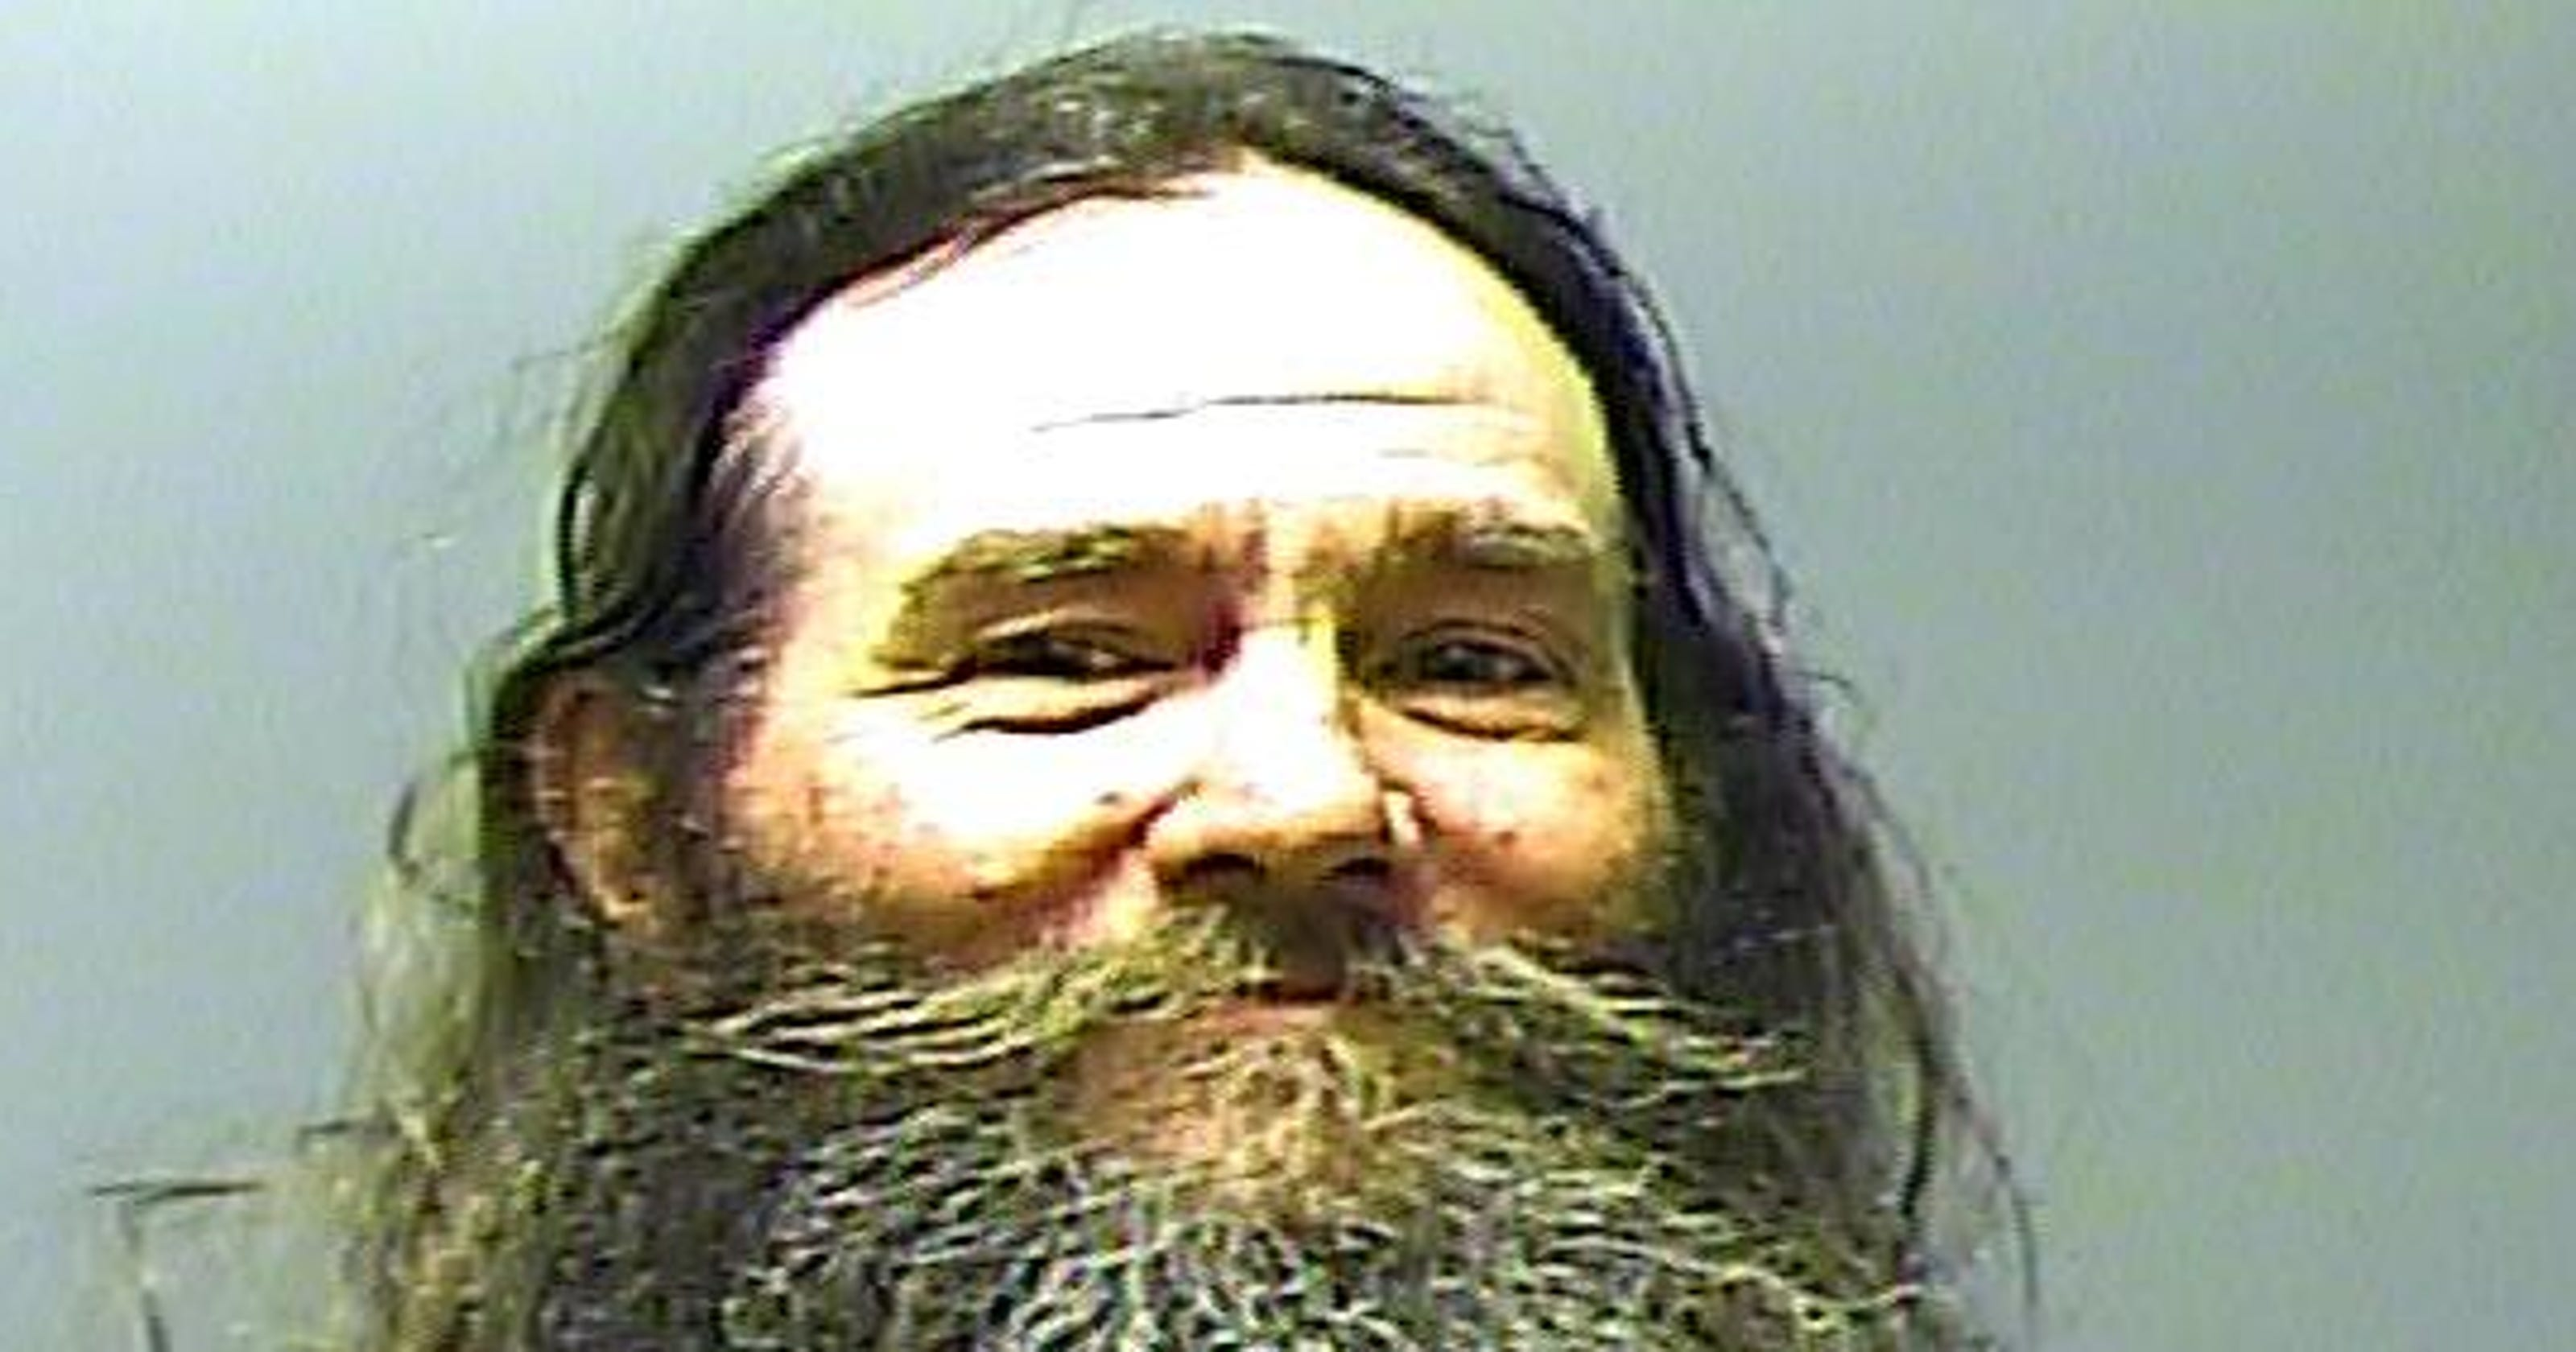 Affidavit sheds light on major pot bust in Baxter County